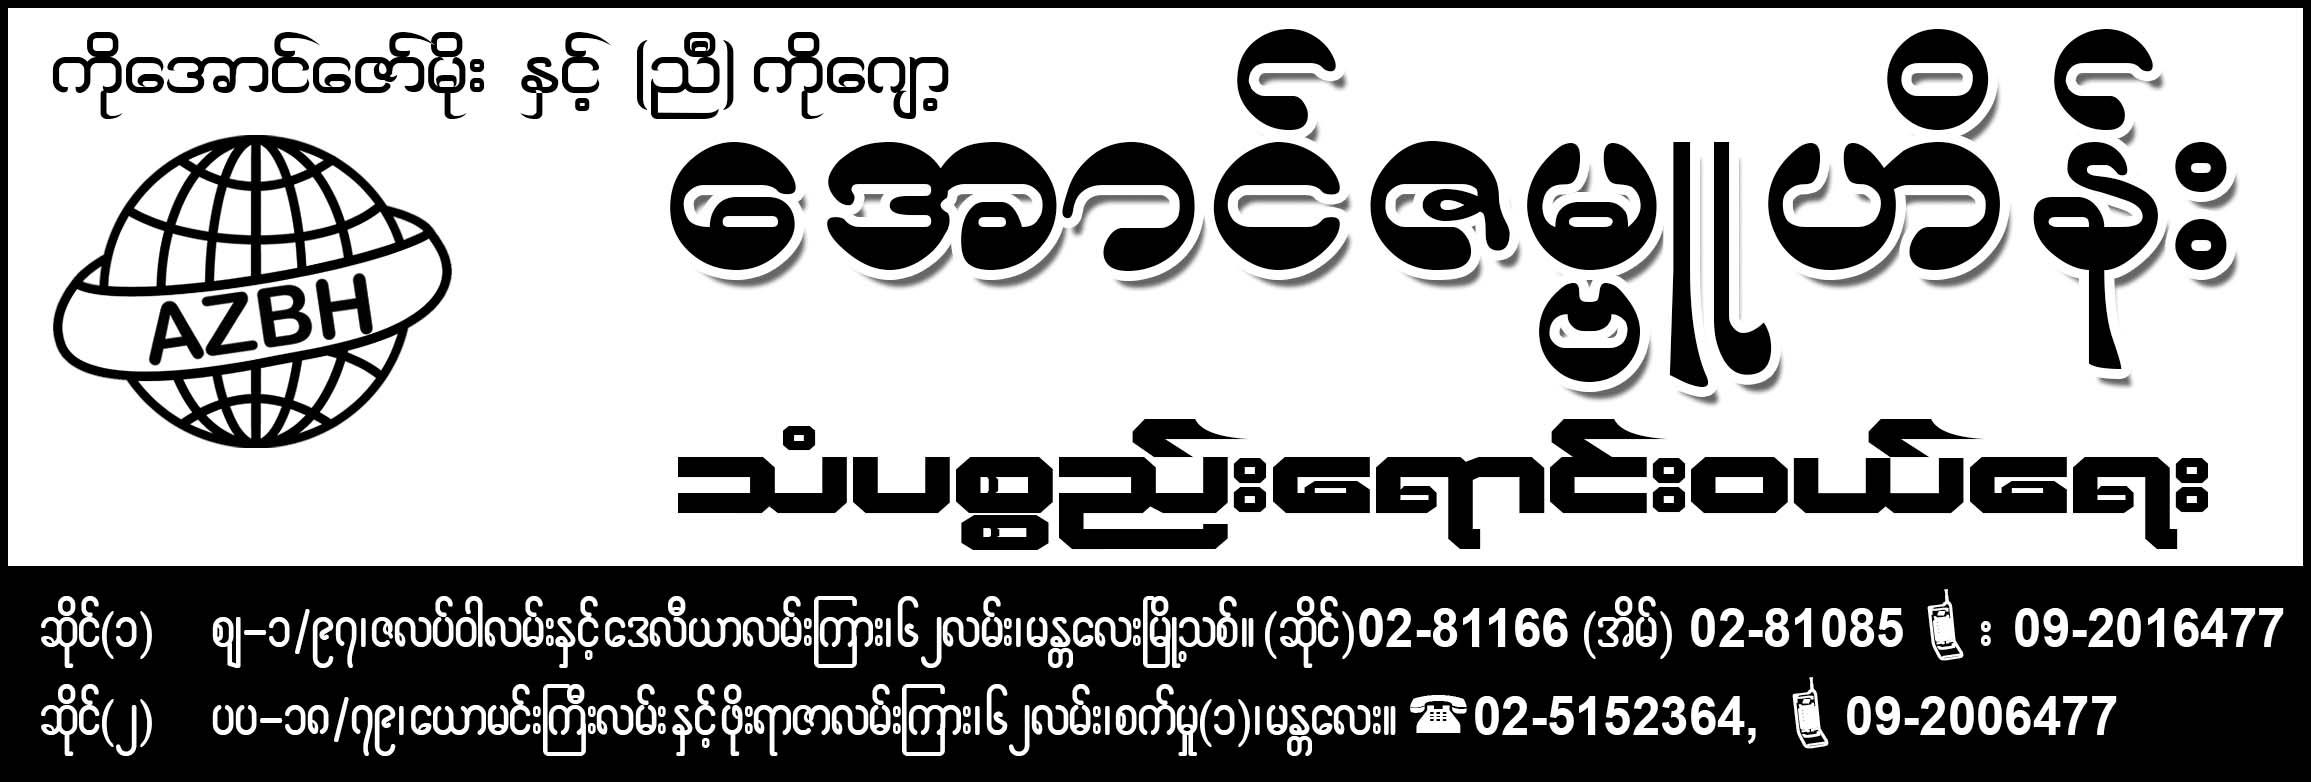 Aung Zabu Hein